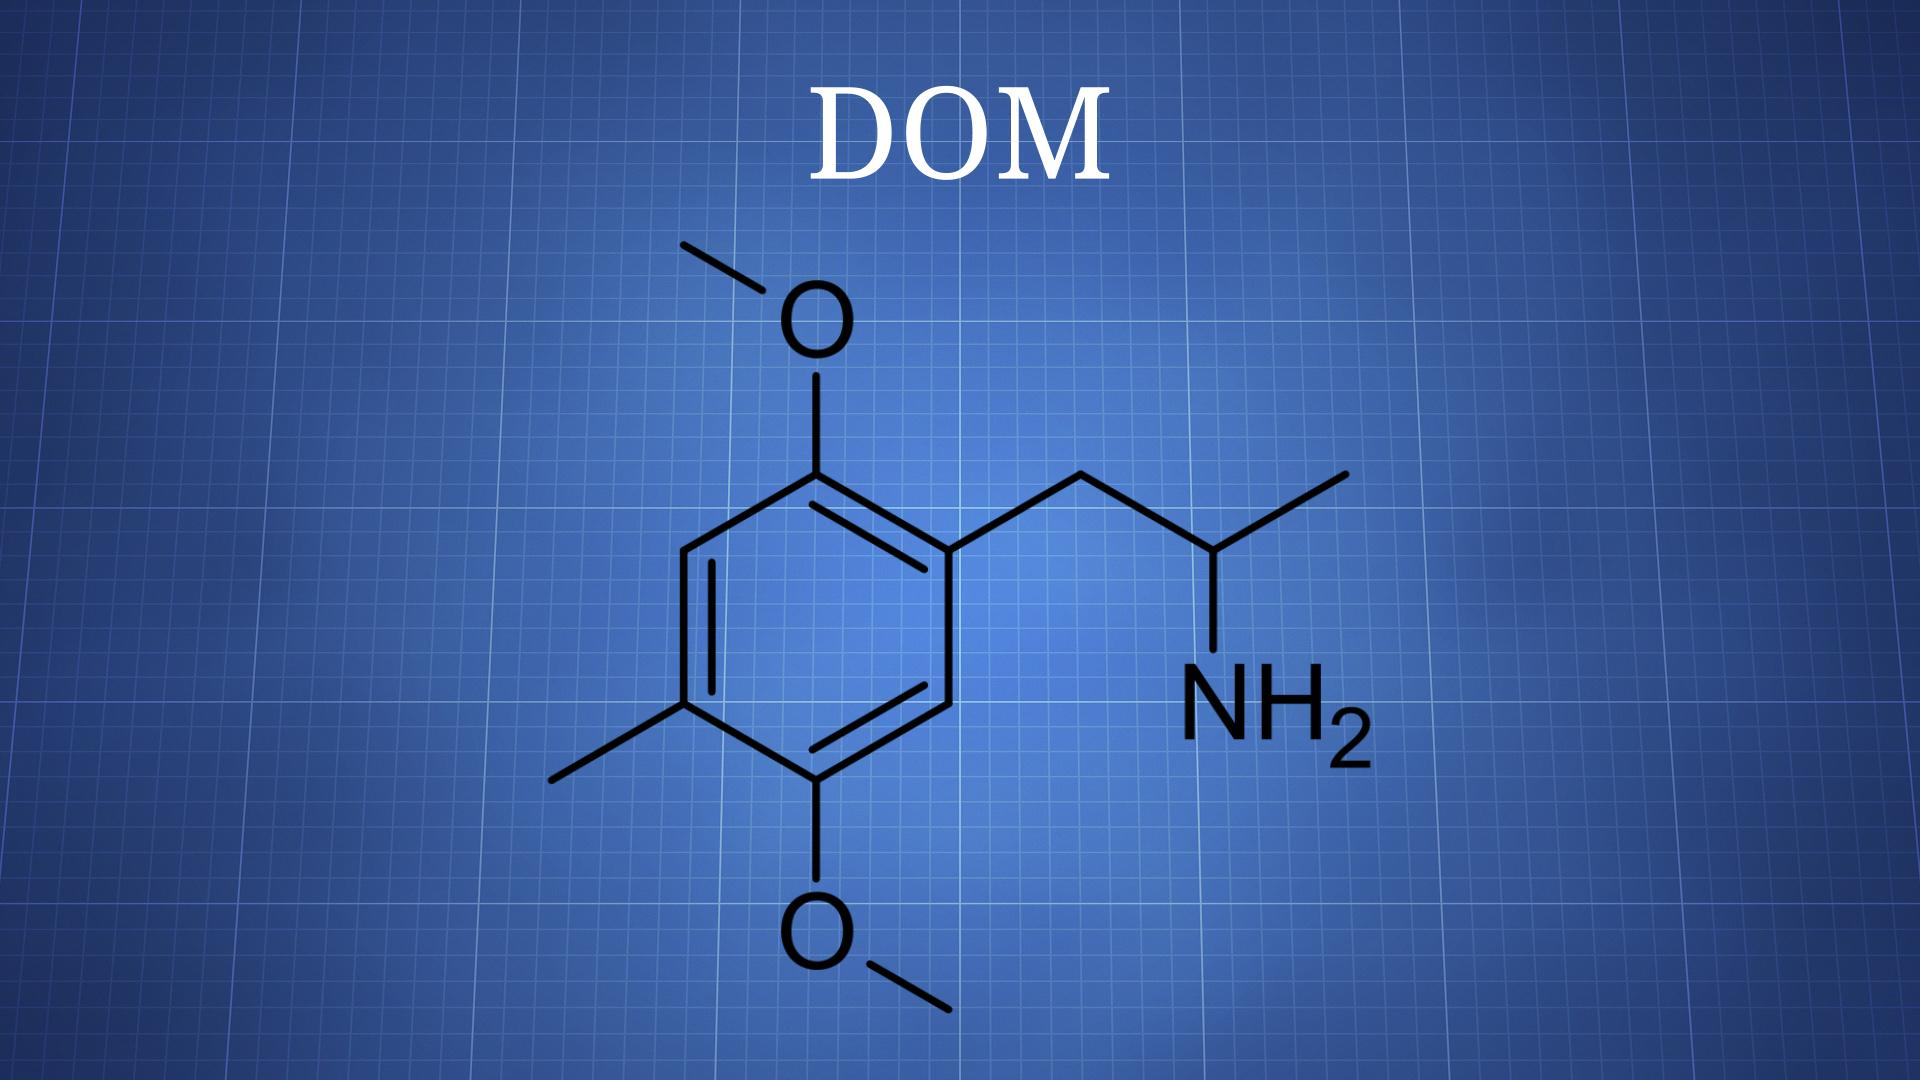 DOM - The Drug Classroom